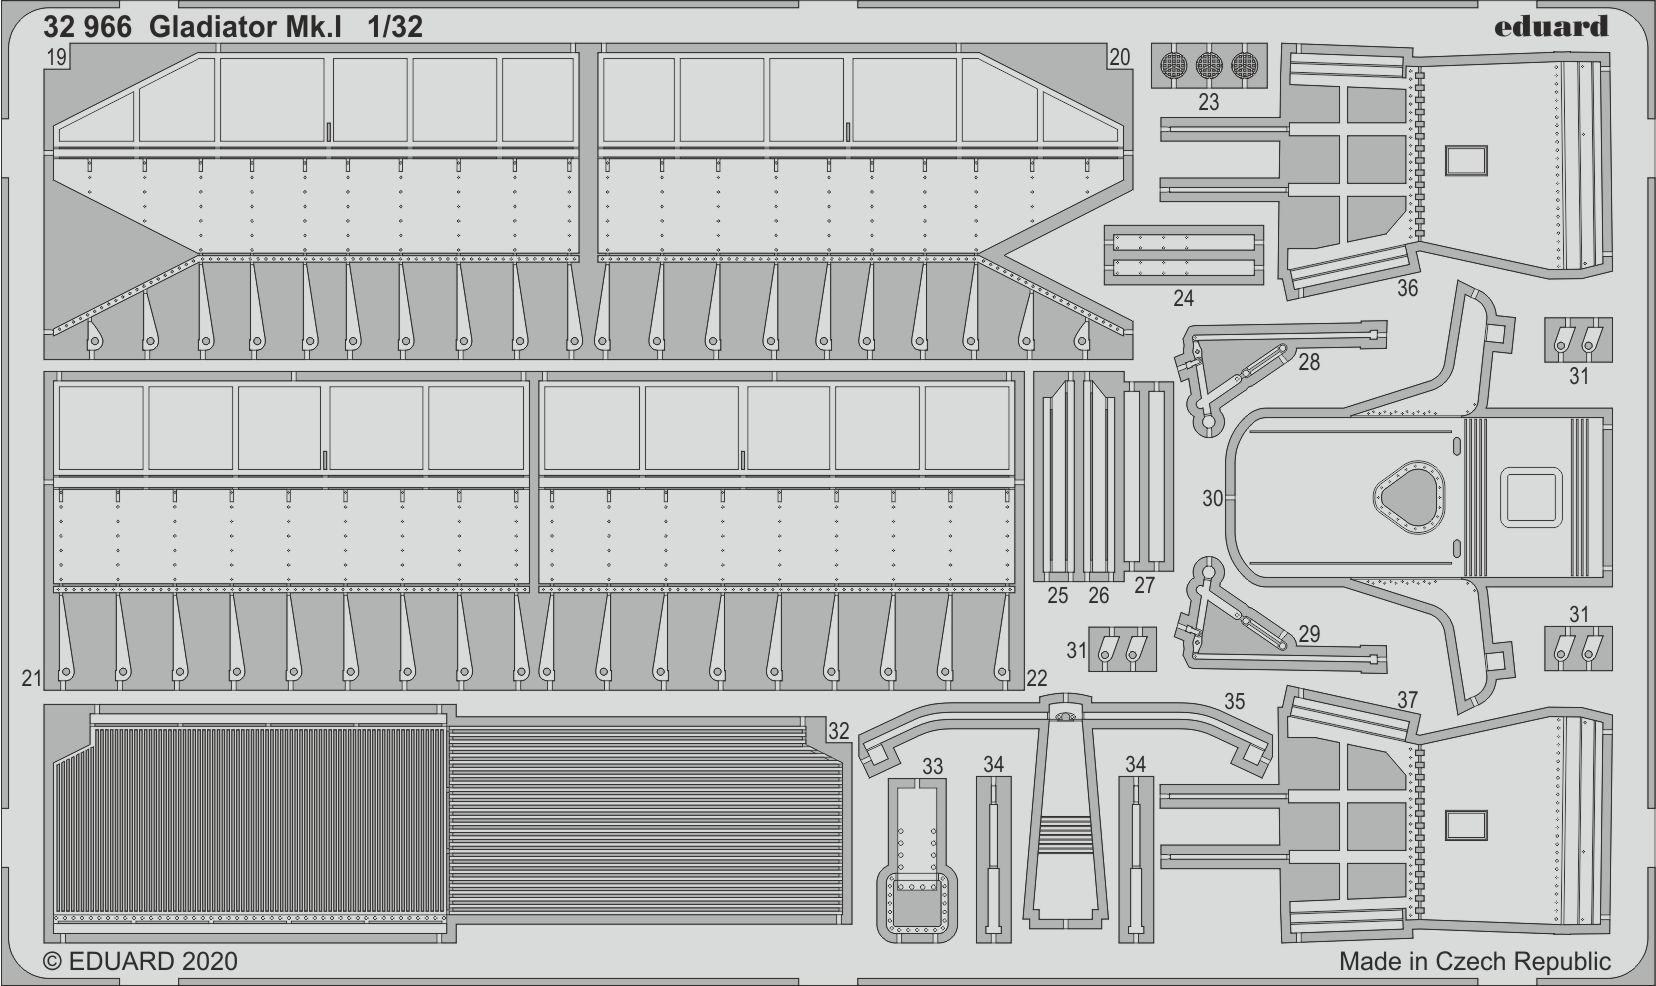 ED32966